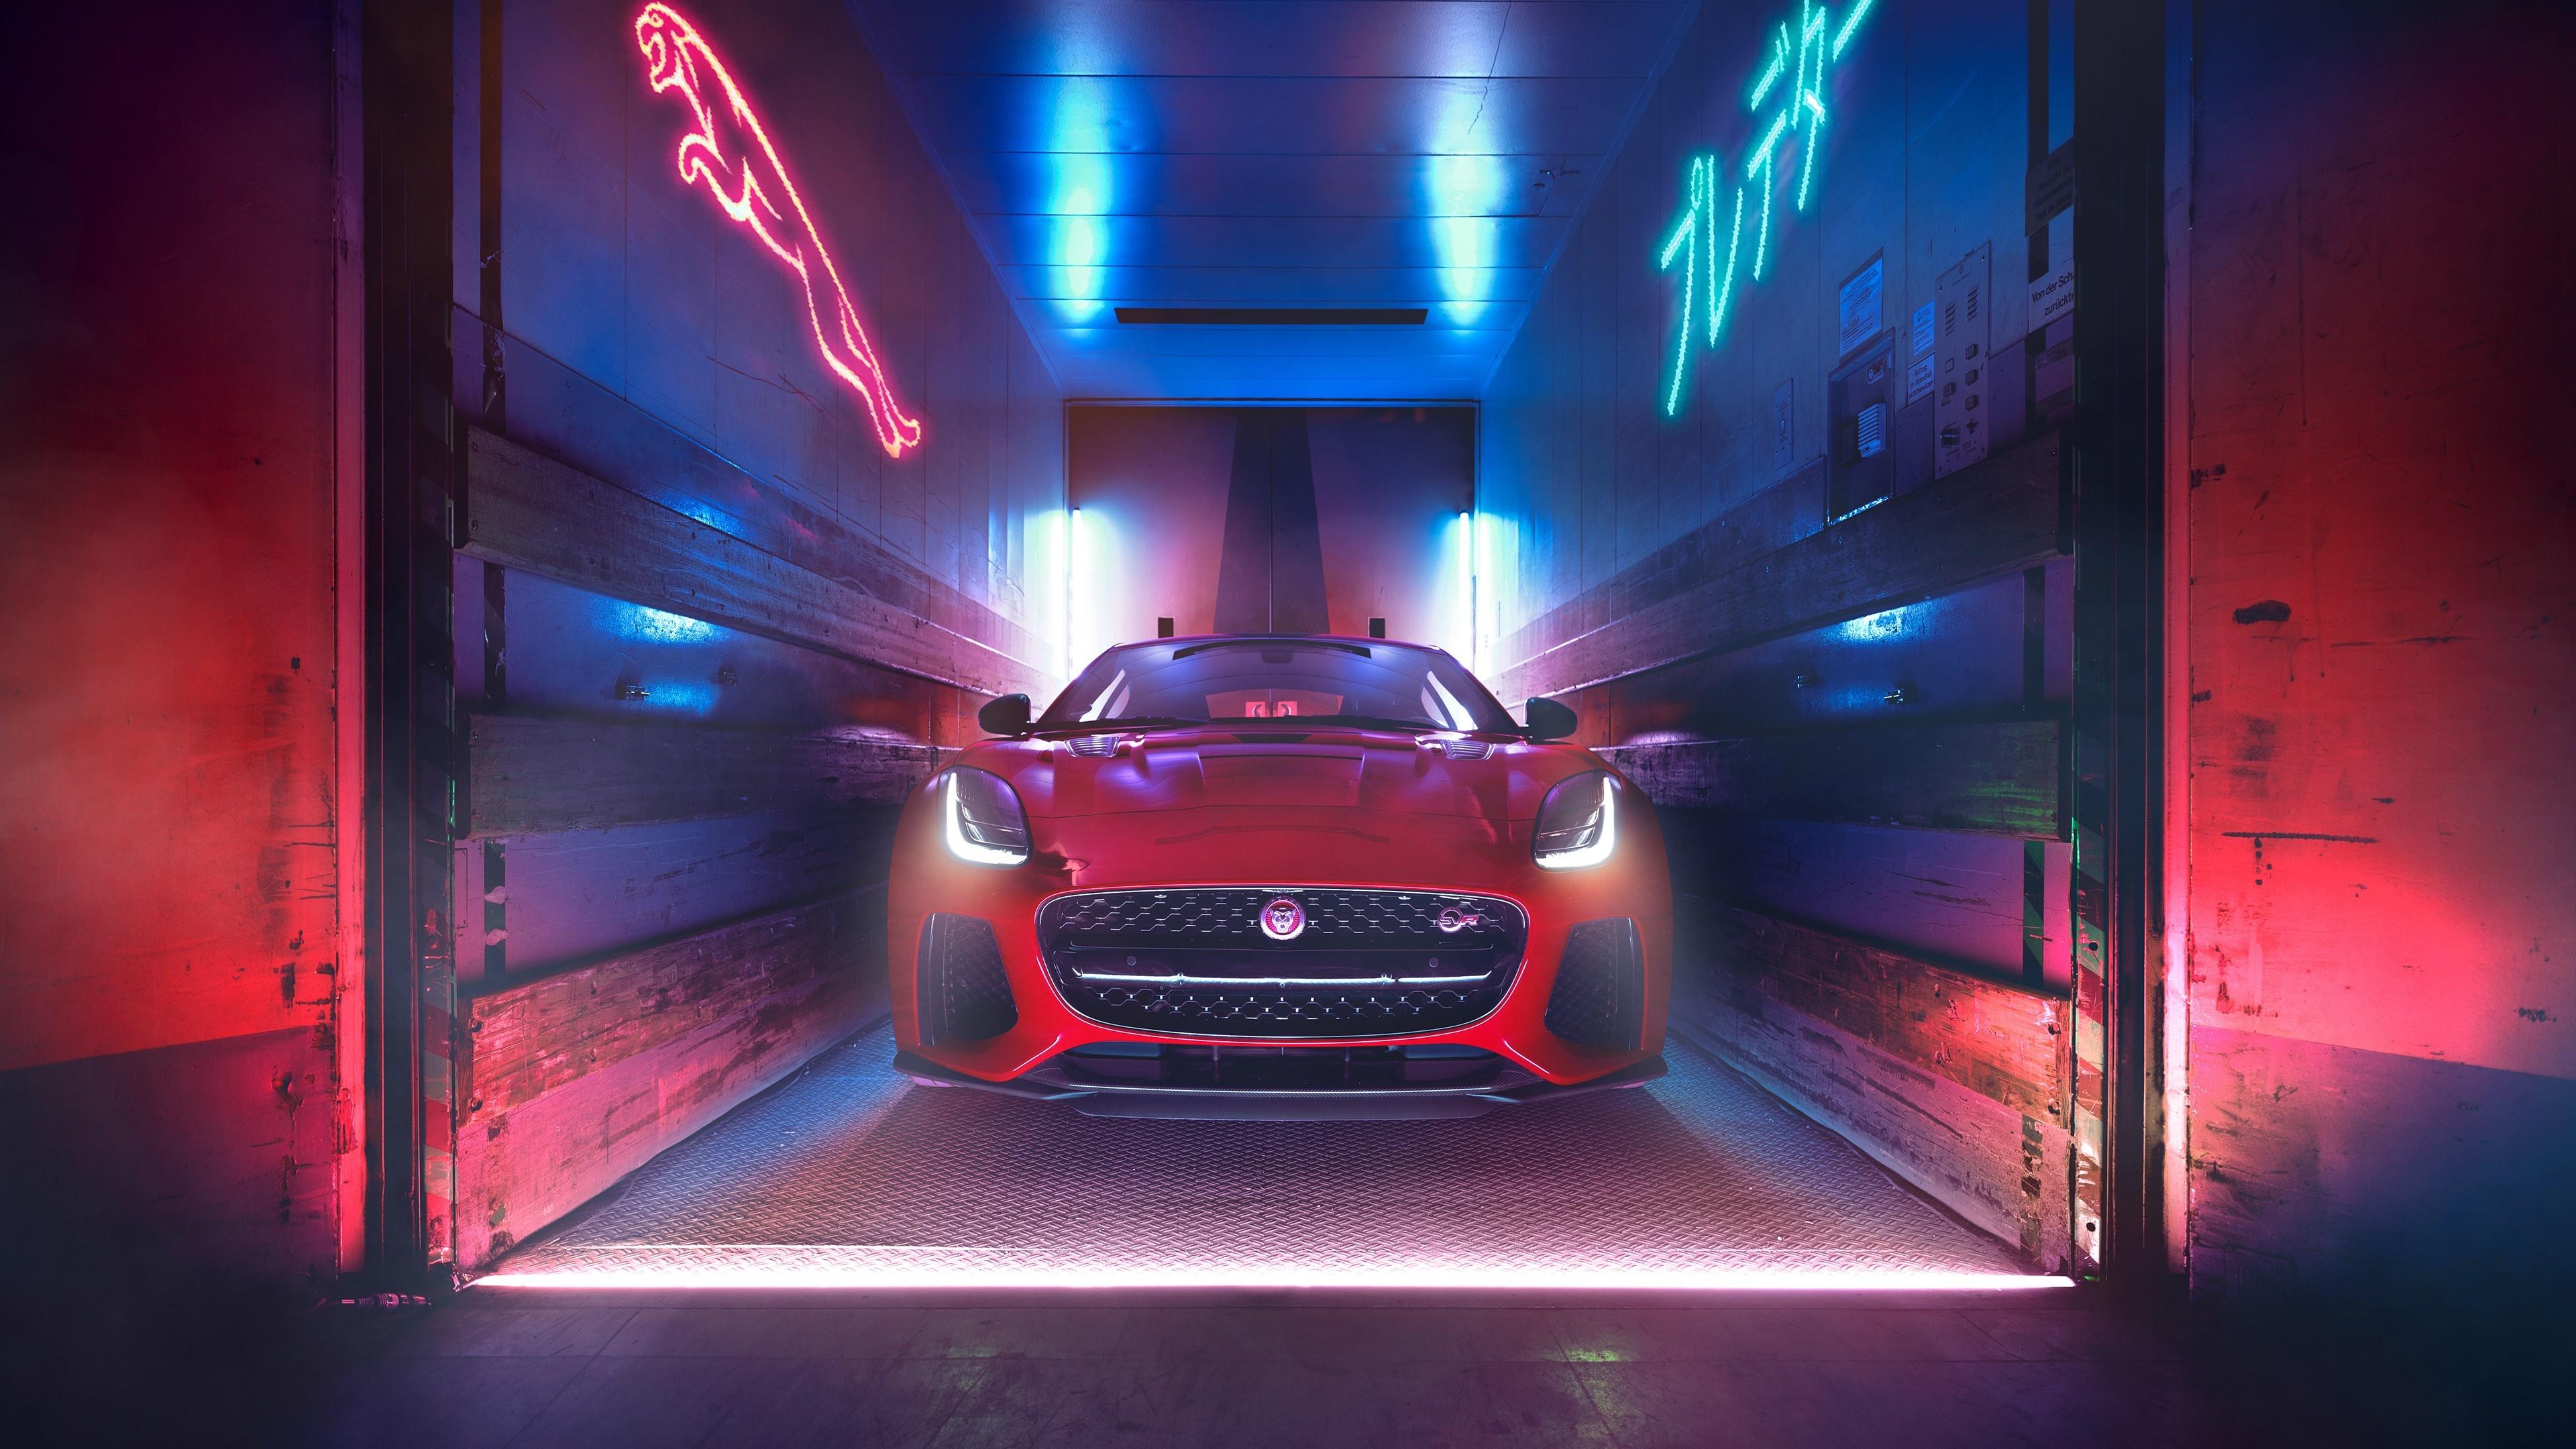 Red Jaguar F Type 4k Ultrahd Wallpaper Backiee Free Ultra Hd